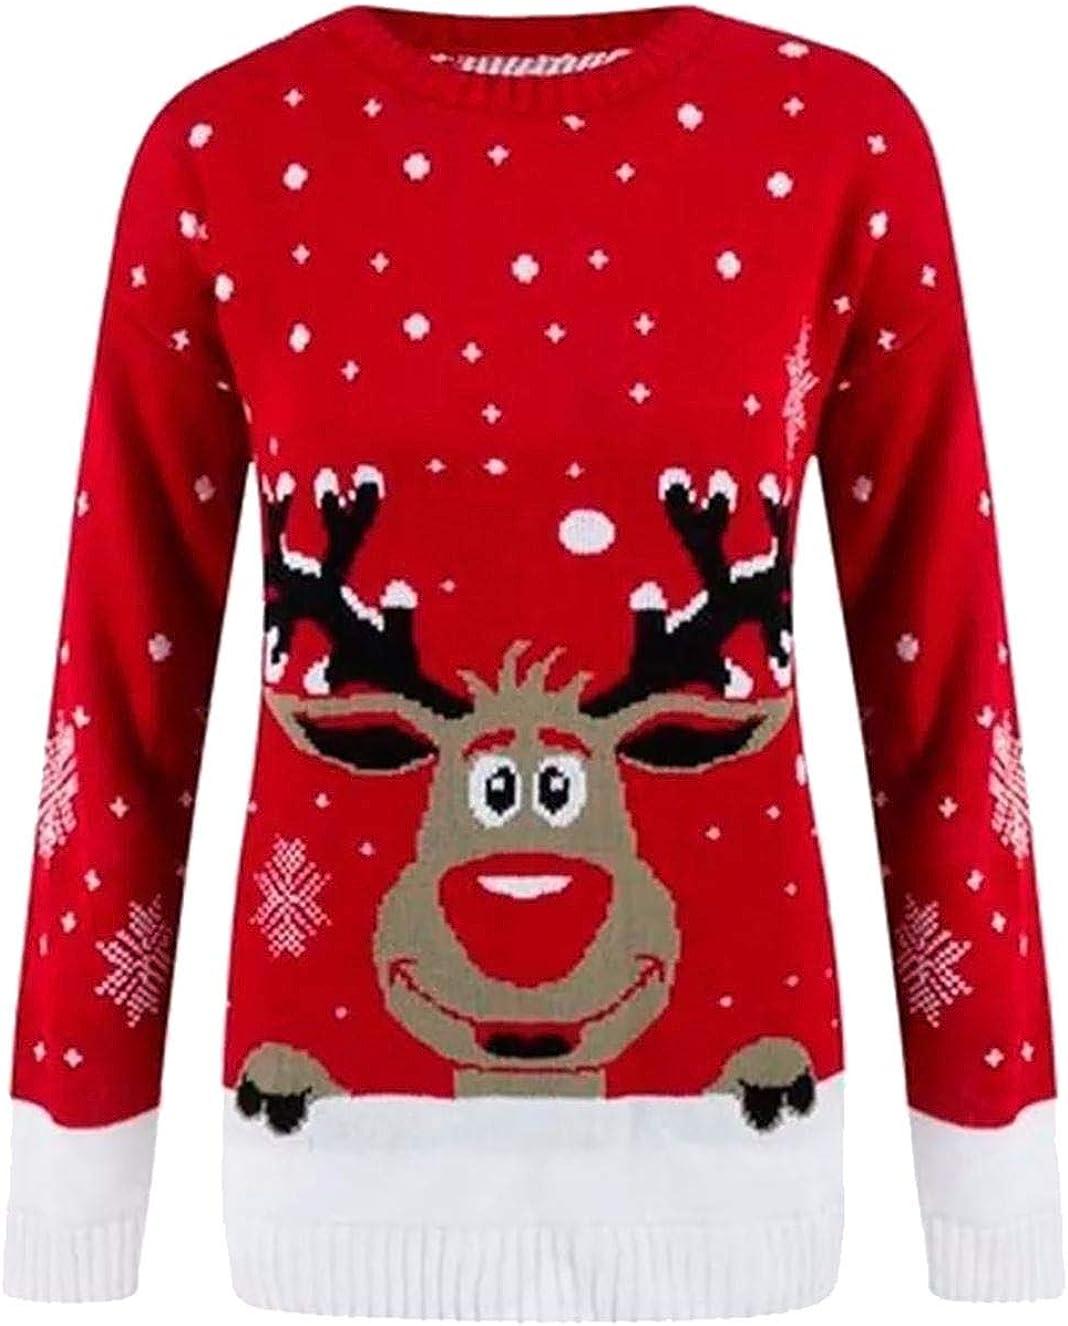 Rimi Hanger Children Reindeer Christmas Jumper Boys Girls Fancy Xmas Party Wear Sweater Top 3-12 Years